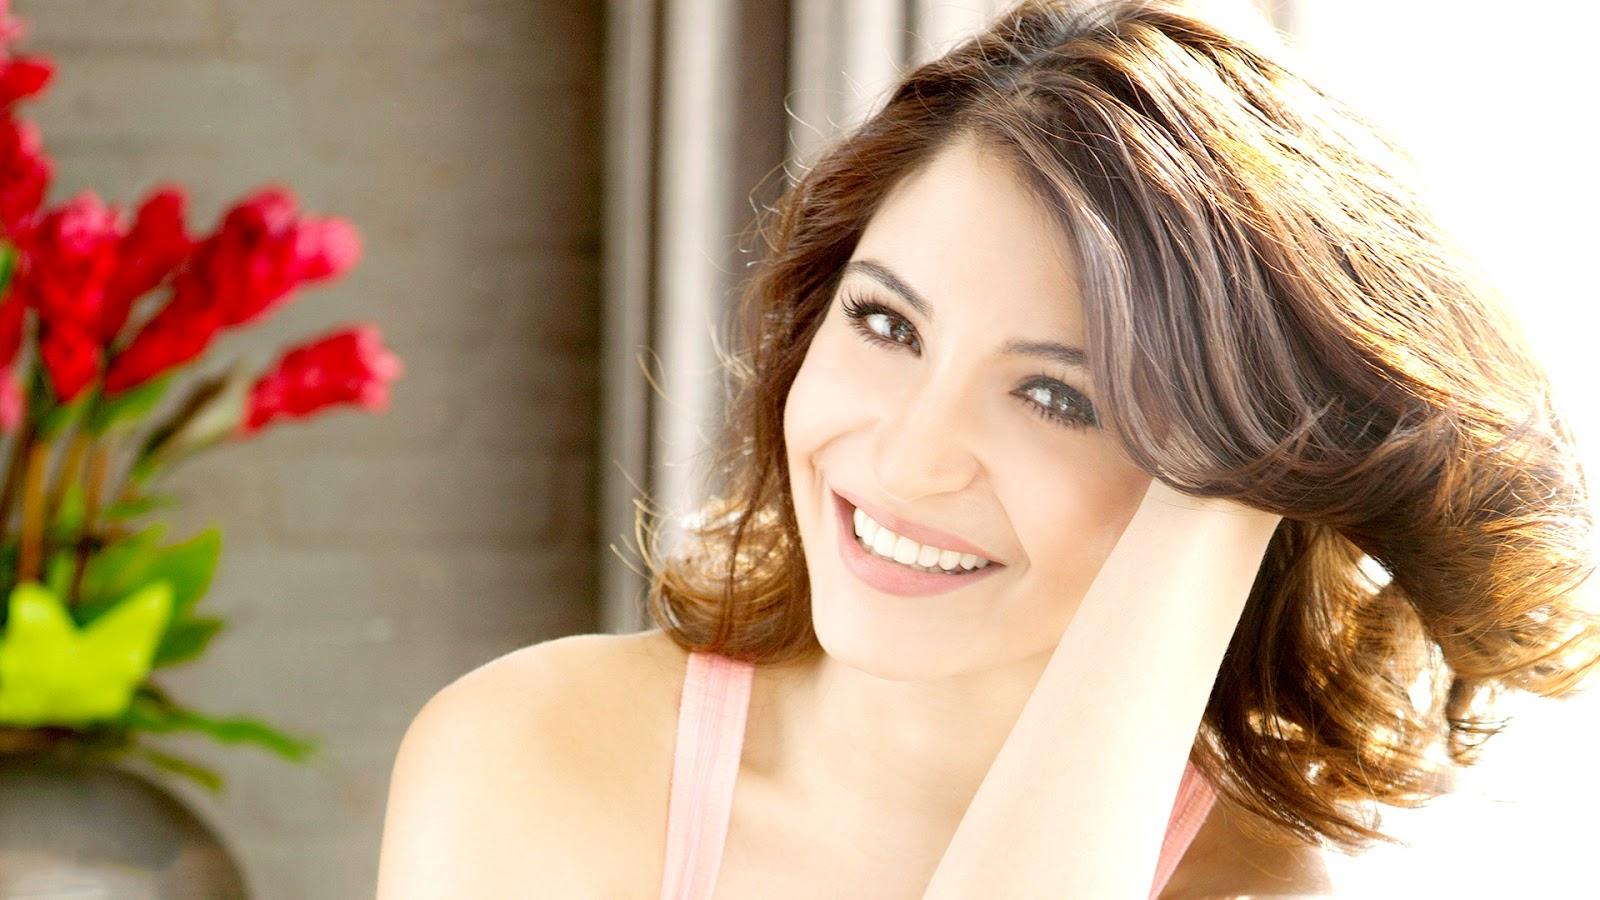 Anushka Sharma Wallpapers HD Download Free 1080p ...